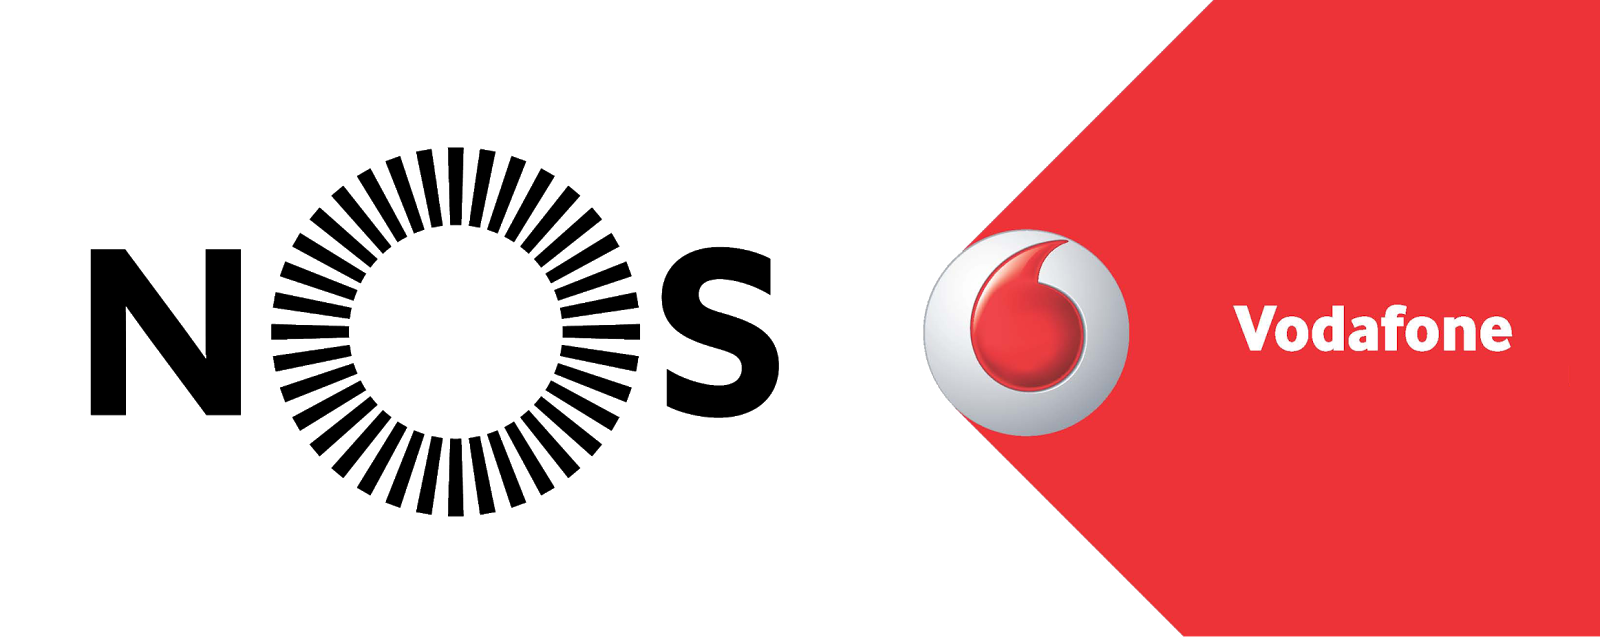 Primeira Liga NOS e Vodafone